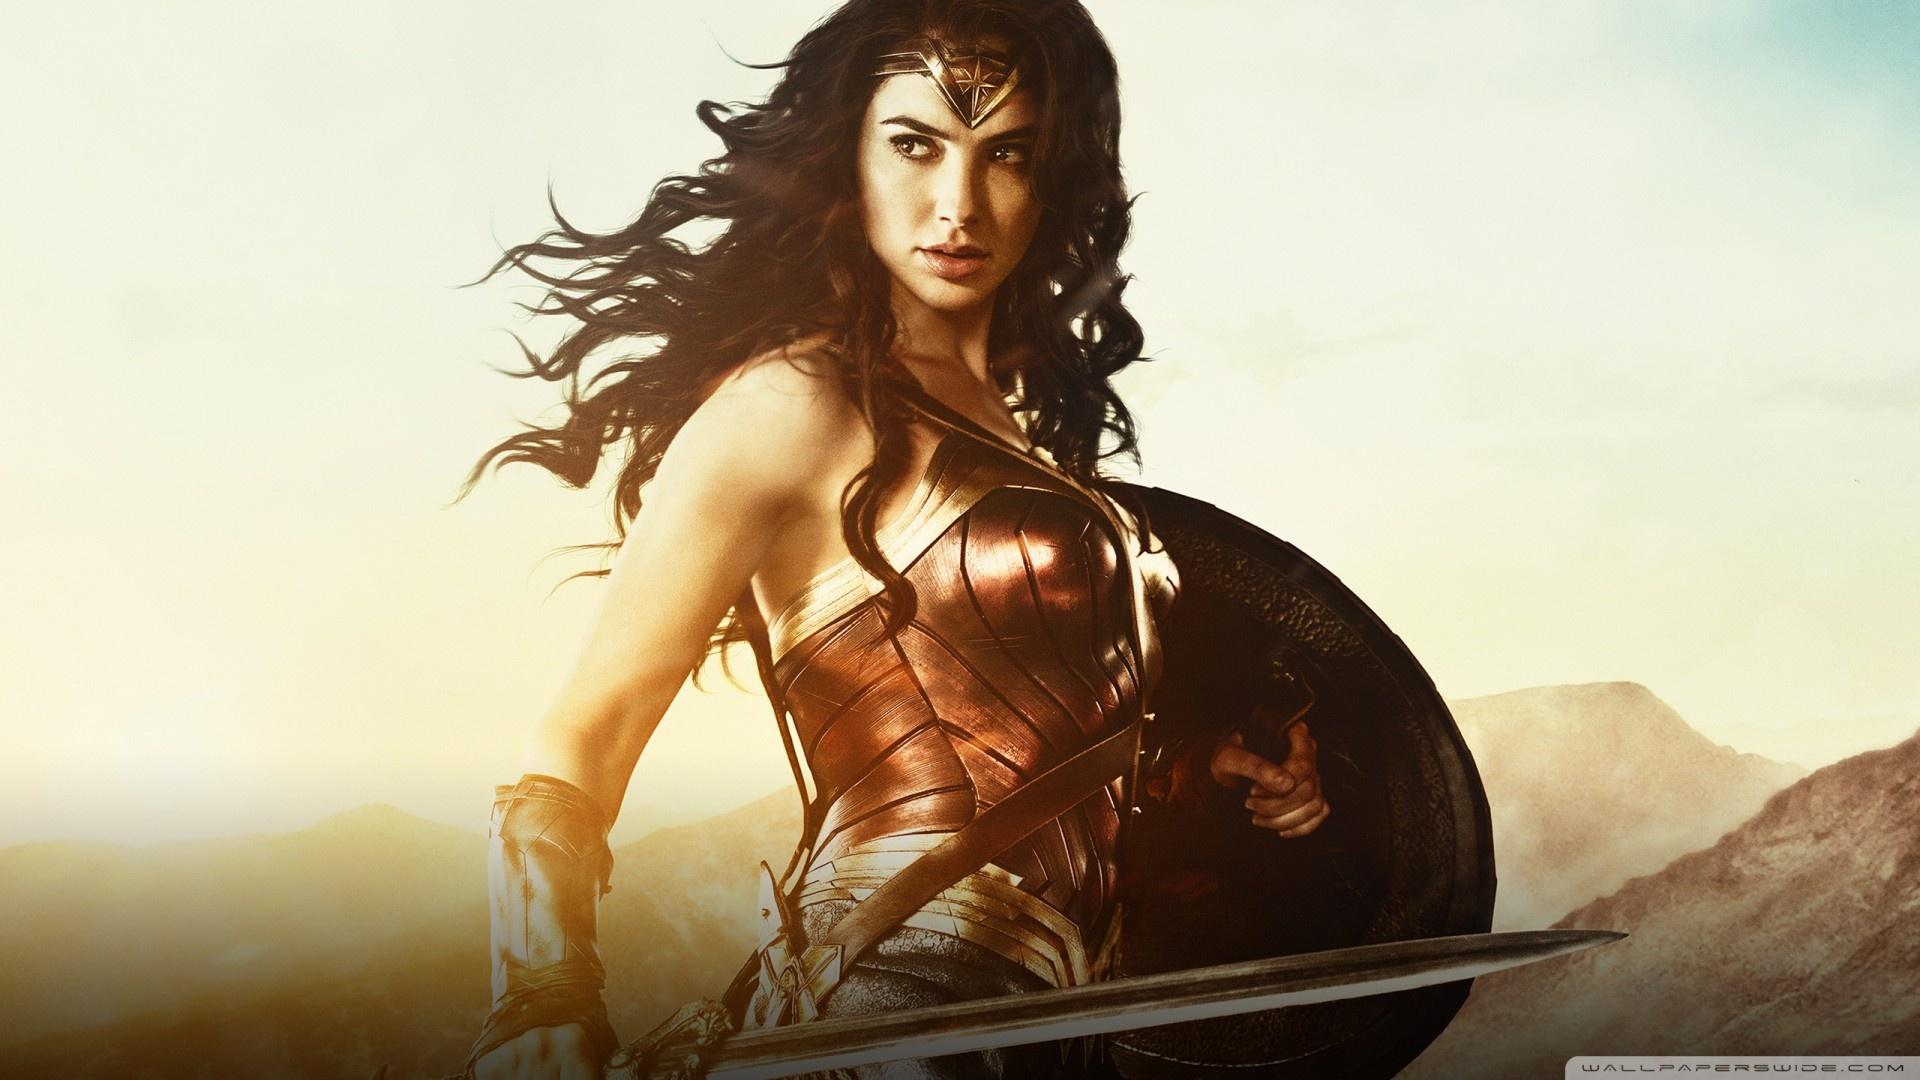 Related Wallpapers Gal Gadot Wonder Woman Hd 330273